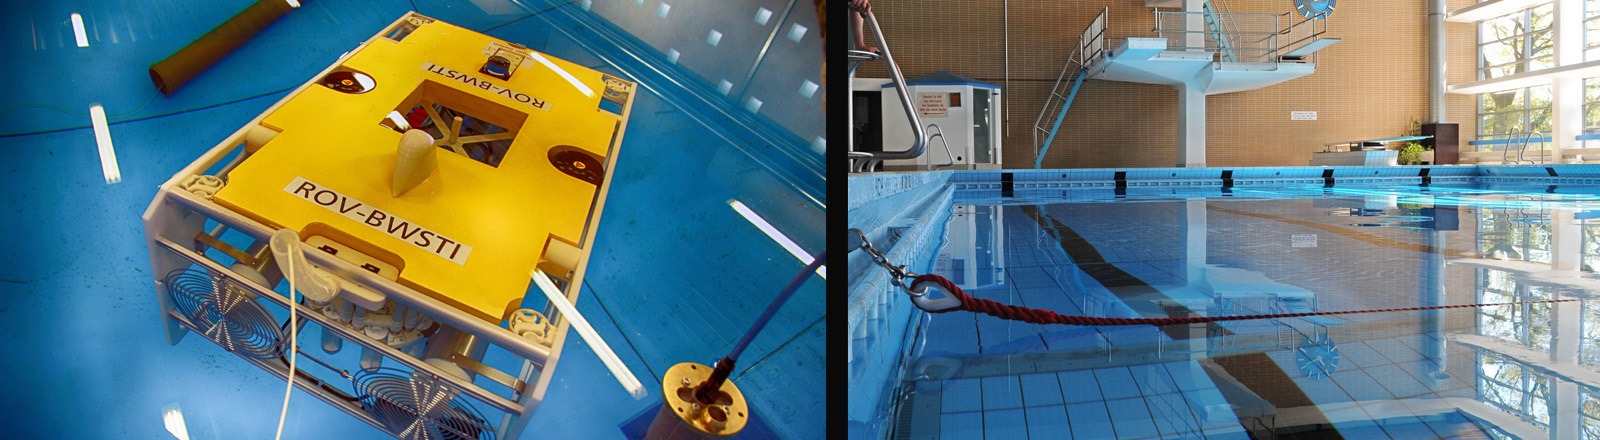 Prototyp des Rettungsroboters vom Fraunhofer Institu